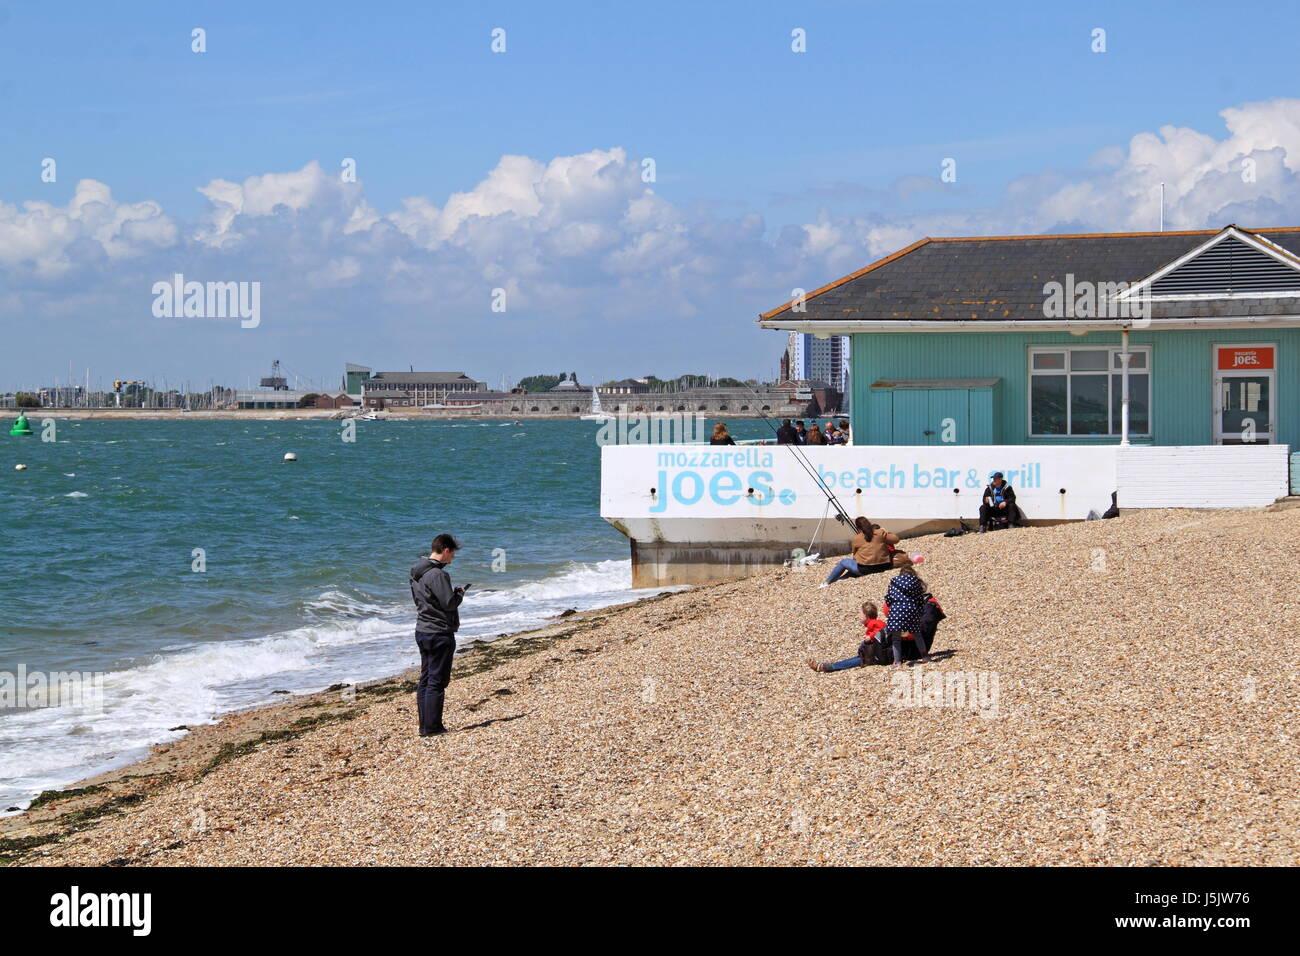 Mozzarella Joes, Clarence Esplanade, Southsea, Portsmouth, Hampshire, England, Great Britain, United Kingdom, UK, Stock Photo